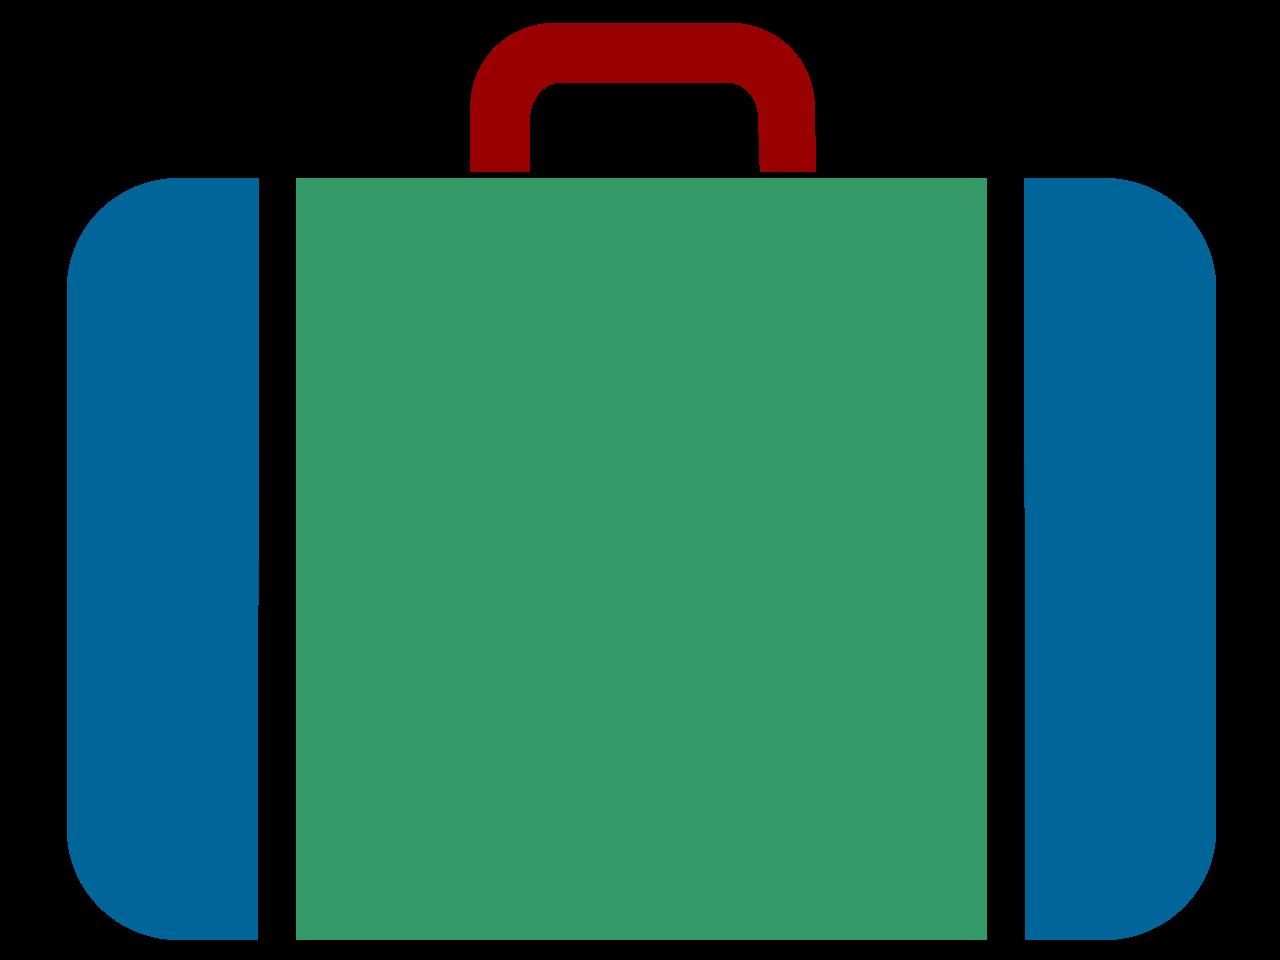 1280x960 Open Suitcase Clipart Free Download Clip Art 2 3